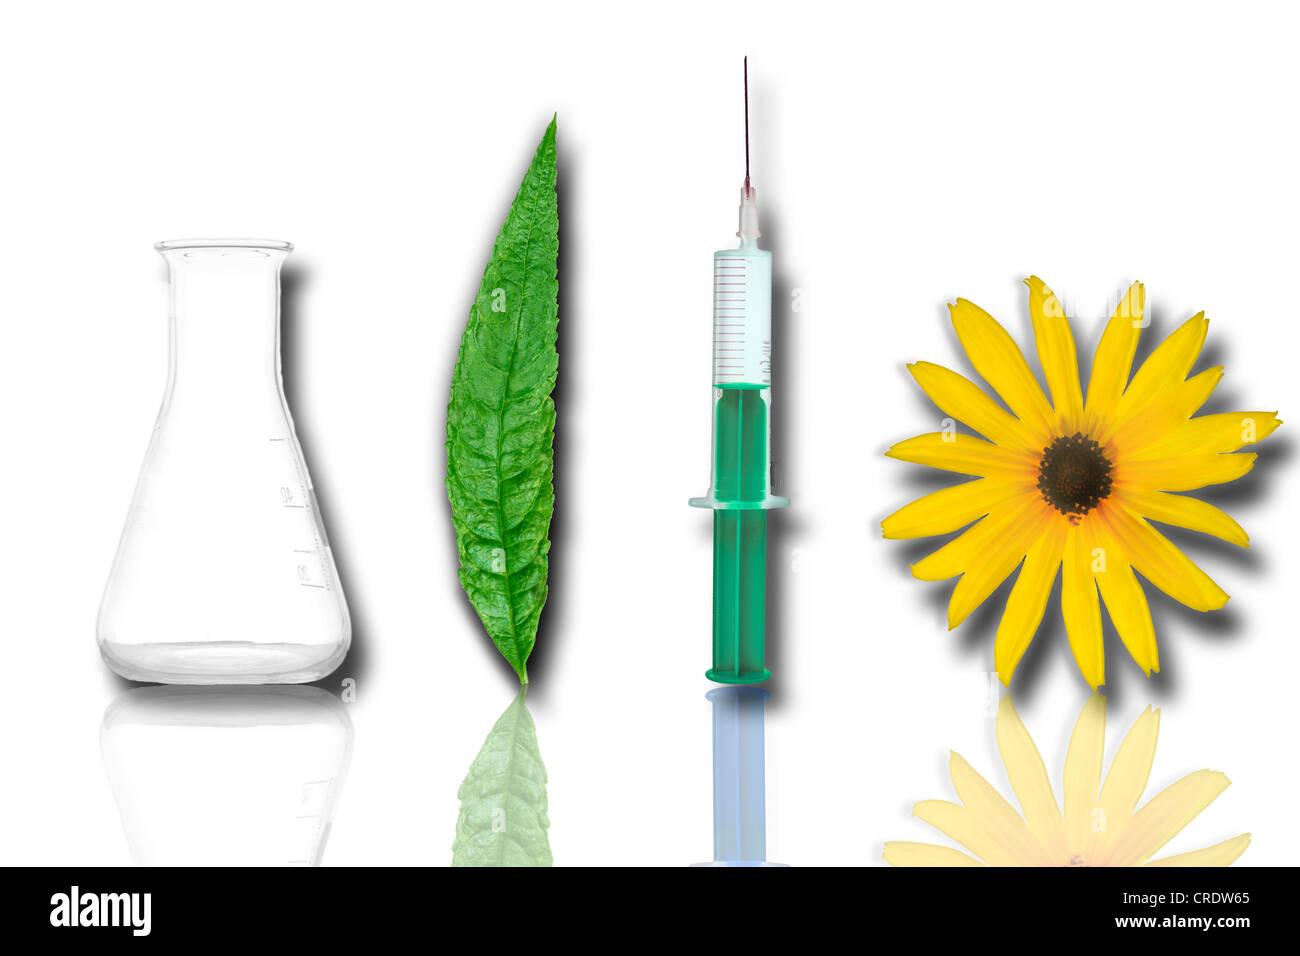 Flask, leaf, hypodermic needle, flower, illustration, Scienceart, Life Sciences - Stock Image